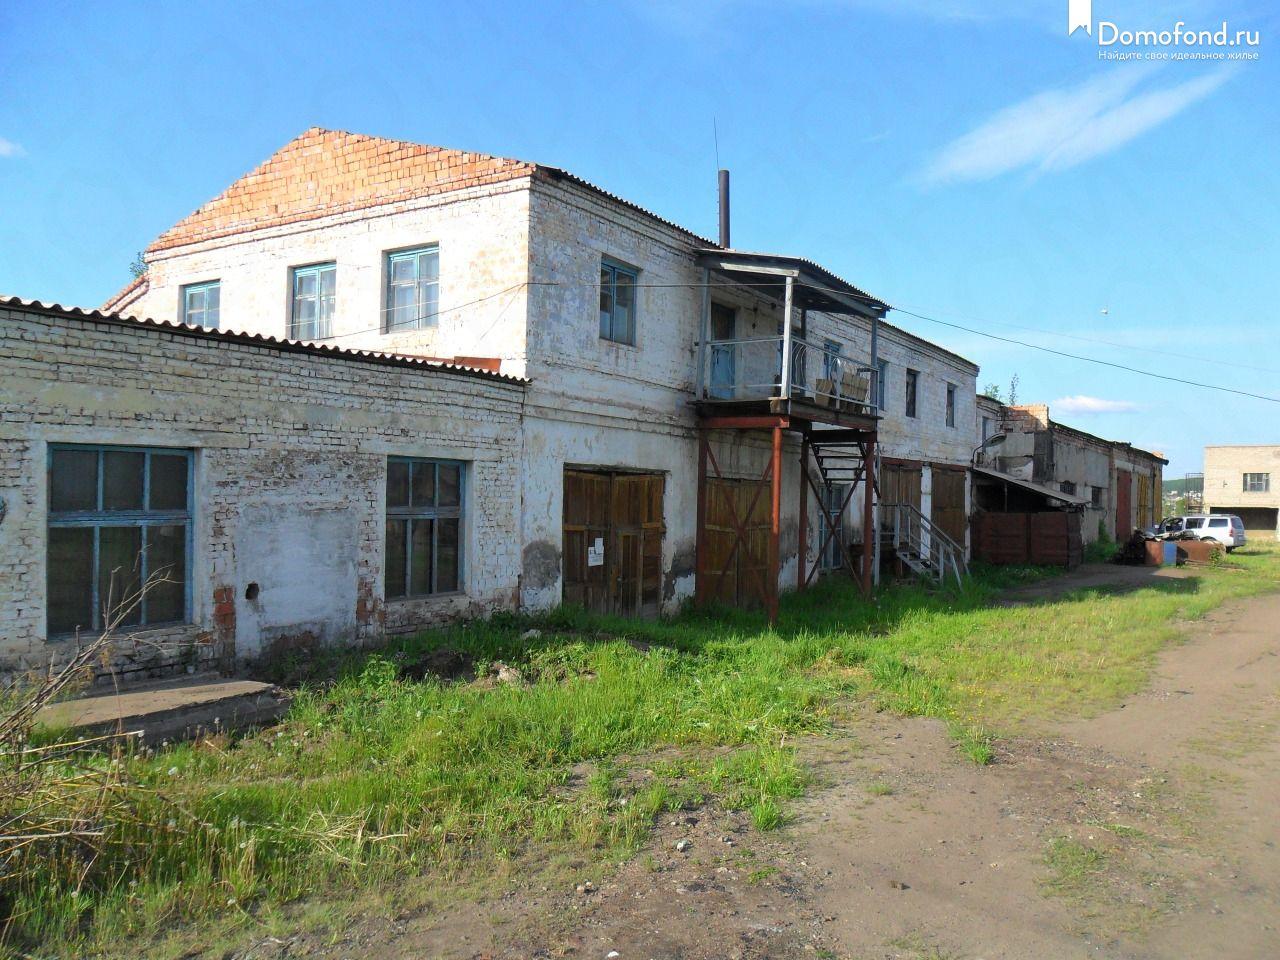 Дом престарелых ужур список домов для престарелых в киеве